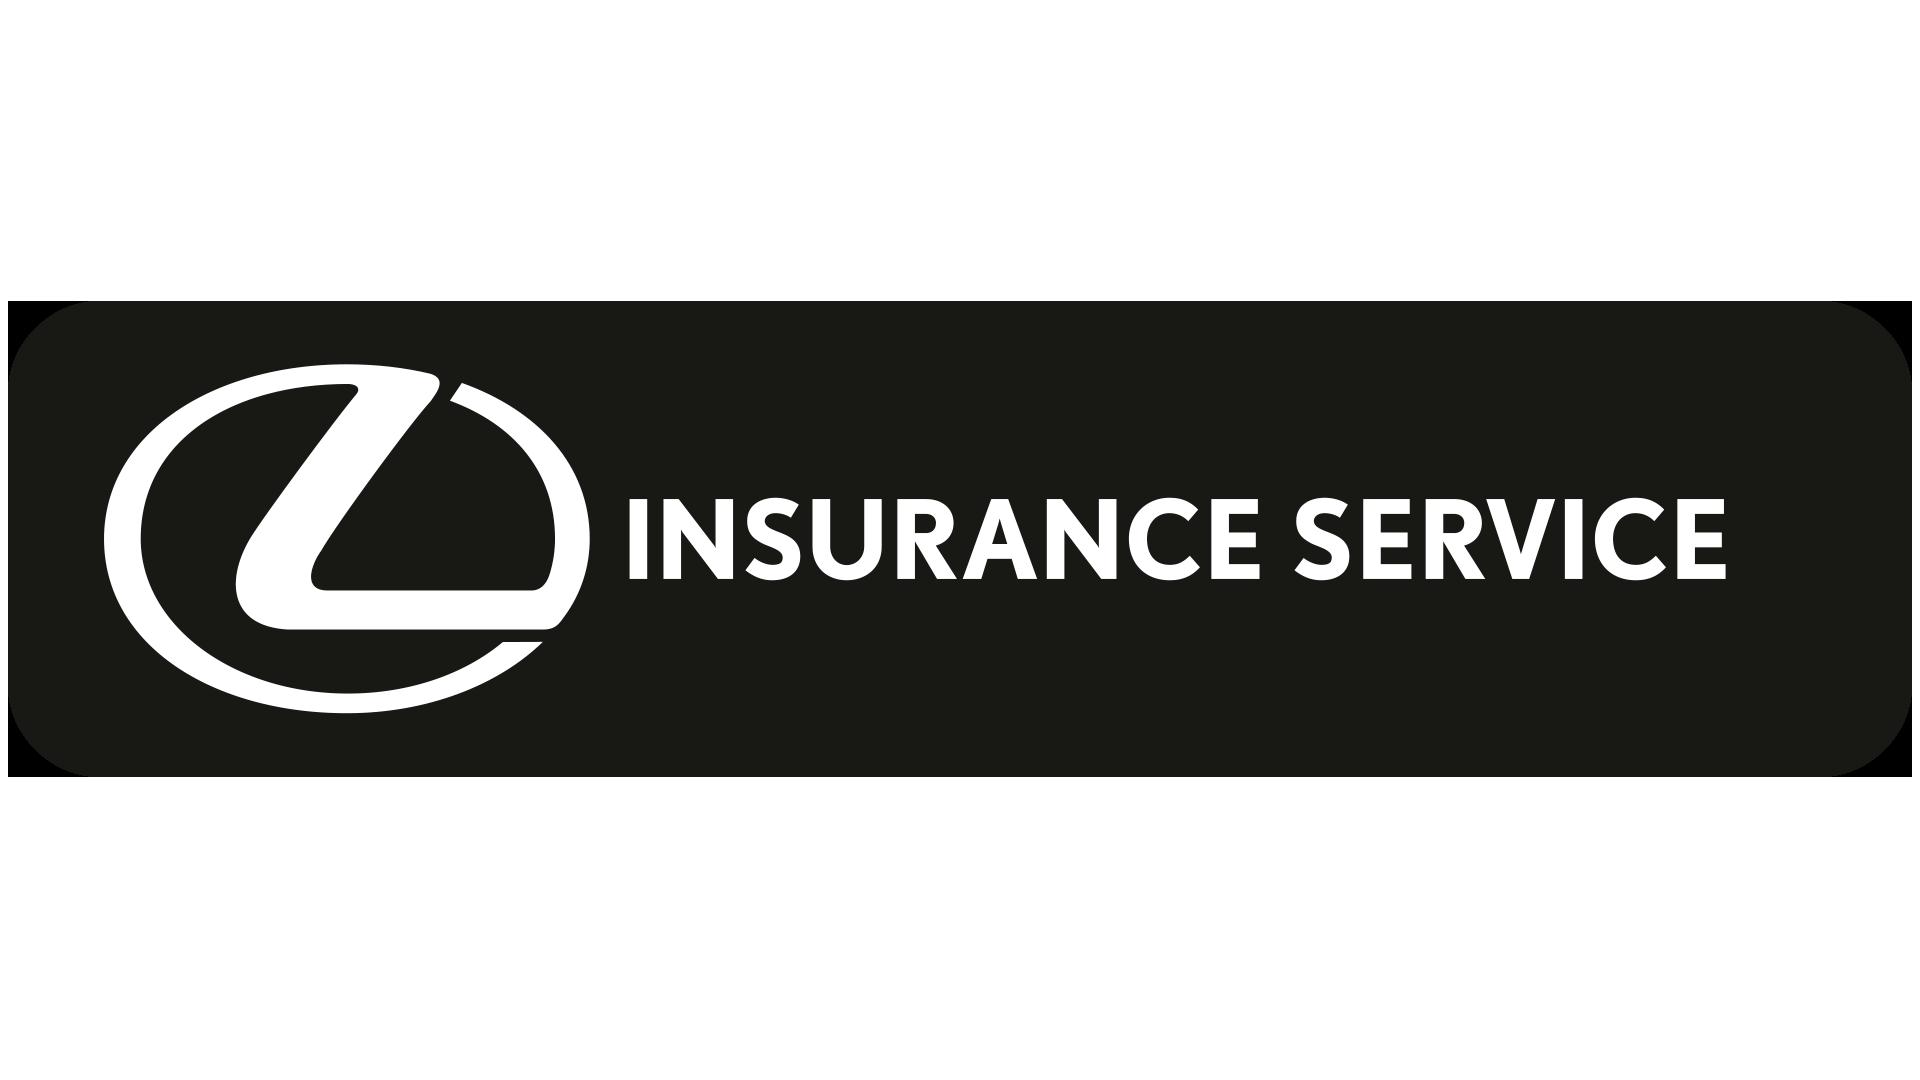 Lexus insurance service logo image